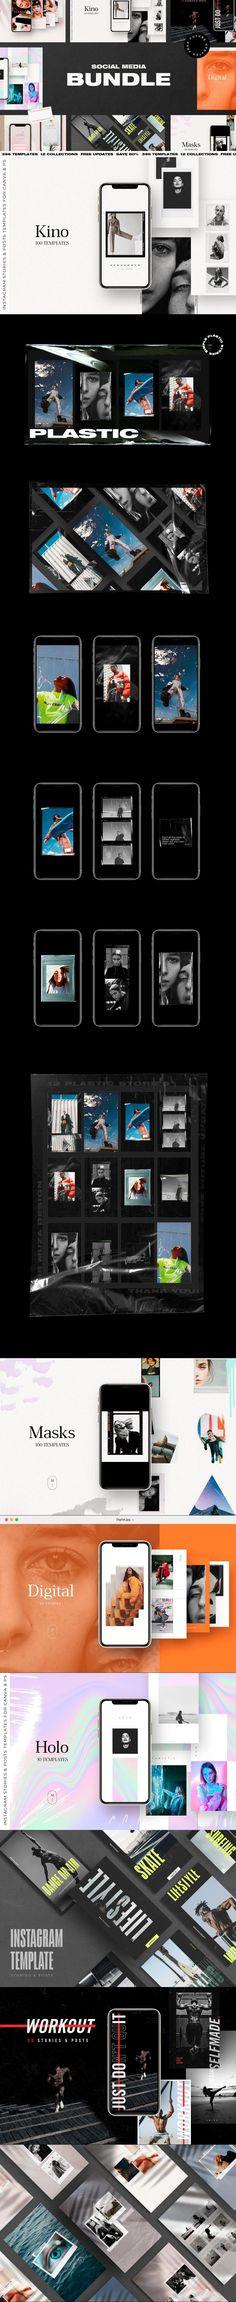 BUNDLE Social Media Pack #bleed #holo #dark #letter #crush #instagramstory #instadesign #instabundle #InstagramFollowers #plasticwraptexture #instagram #postcard #macinterface #plasticwrap #socialmediabundle #InstagramStory #InstagramStoryIdeas #realistic Instagram Design, Instagram Tips, Instagram Story, Workout Template, Sports Templates, Fashion Patterns, Instagram Templates, Instagram Influencer, Text Style